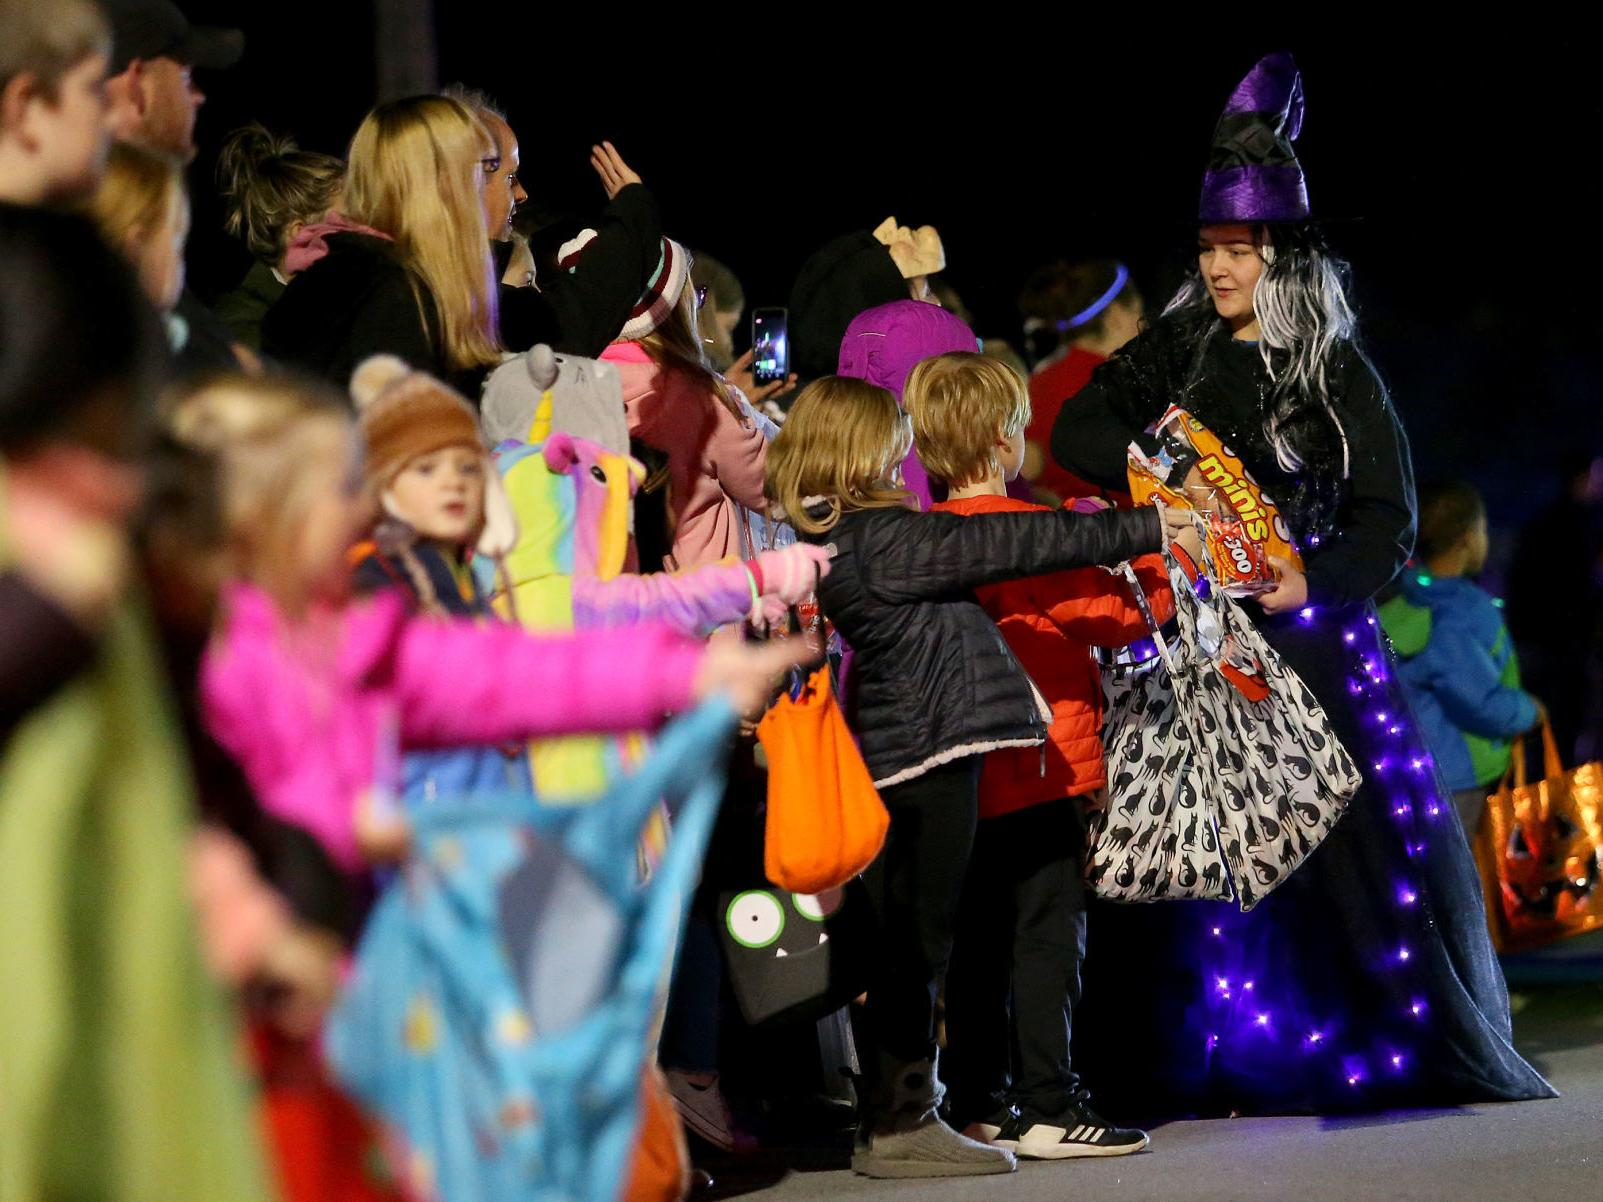 Quad Cities Halloween Parties October 26, 2020 HALLOWEEN CALENDAR | Fun and Entertainment | qctimes.com